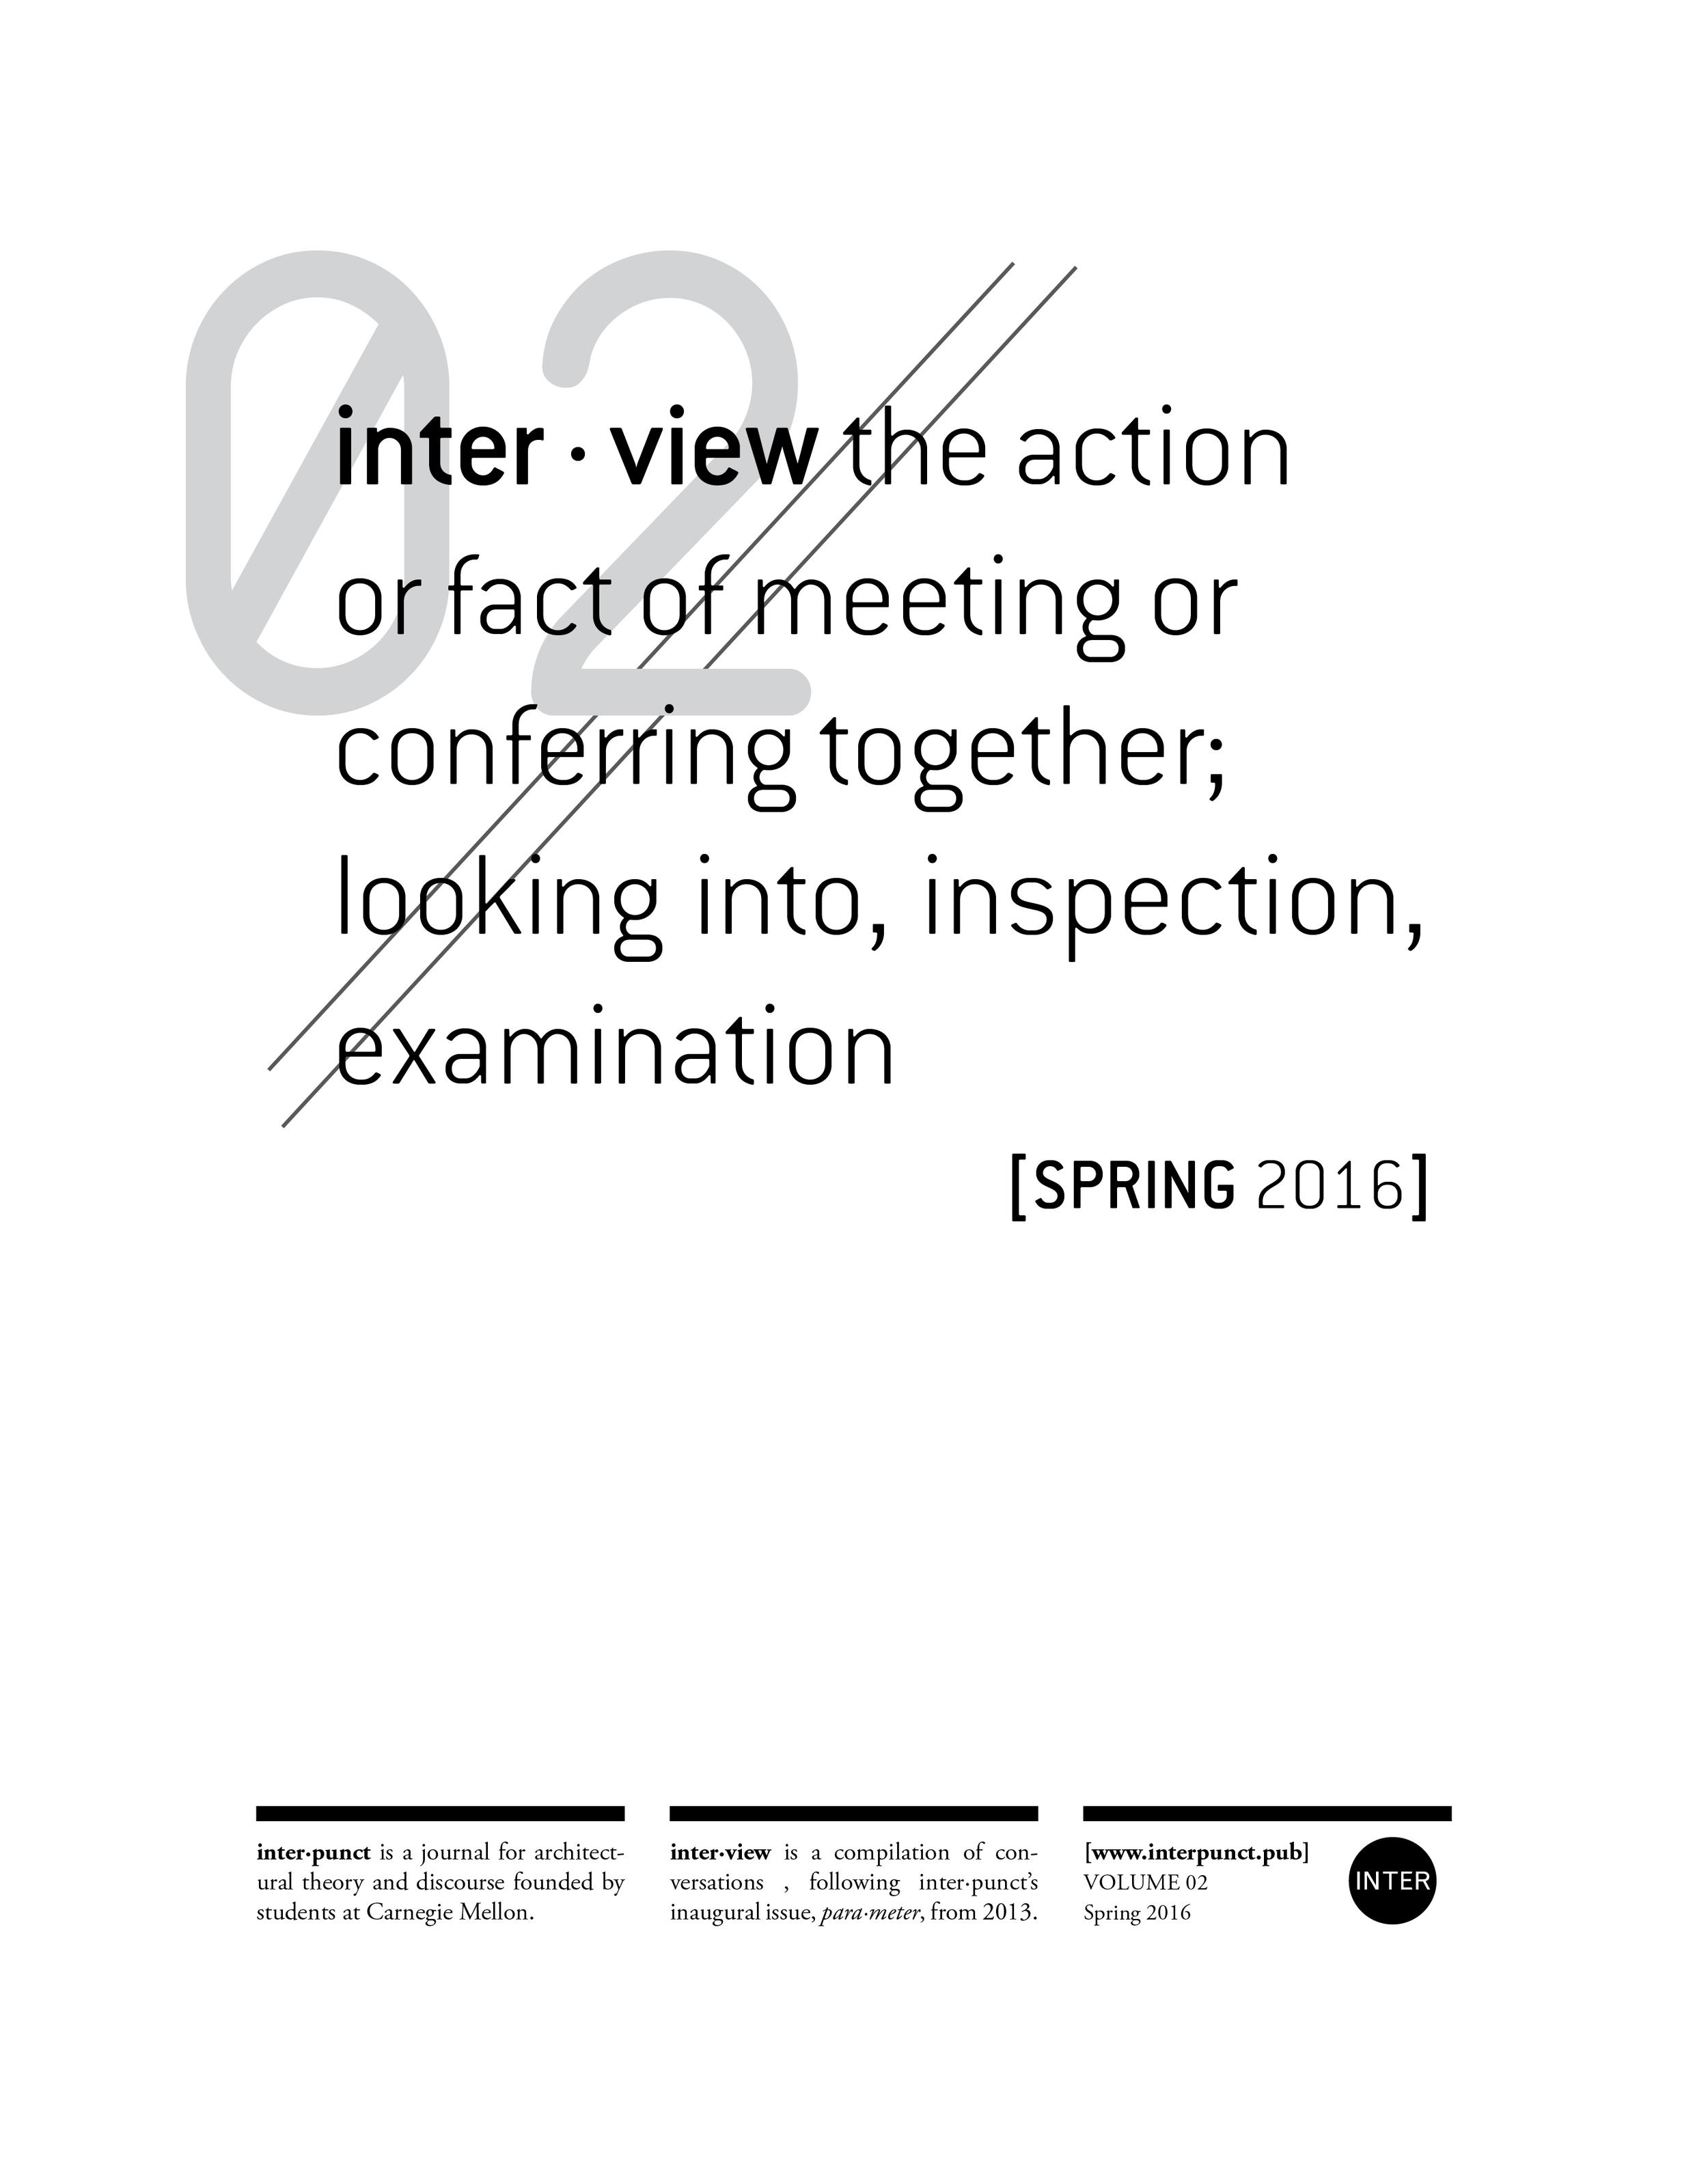 Interpunct_Posters.jpg